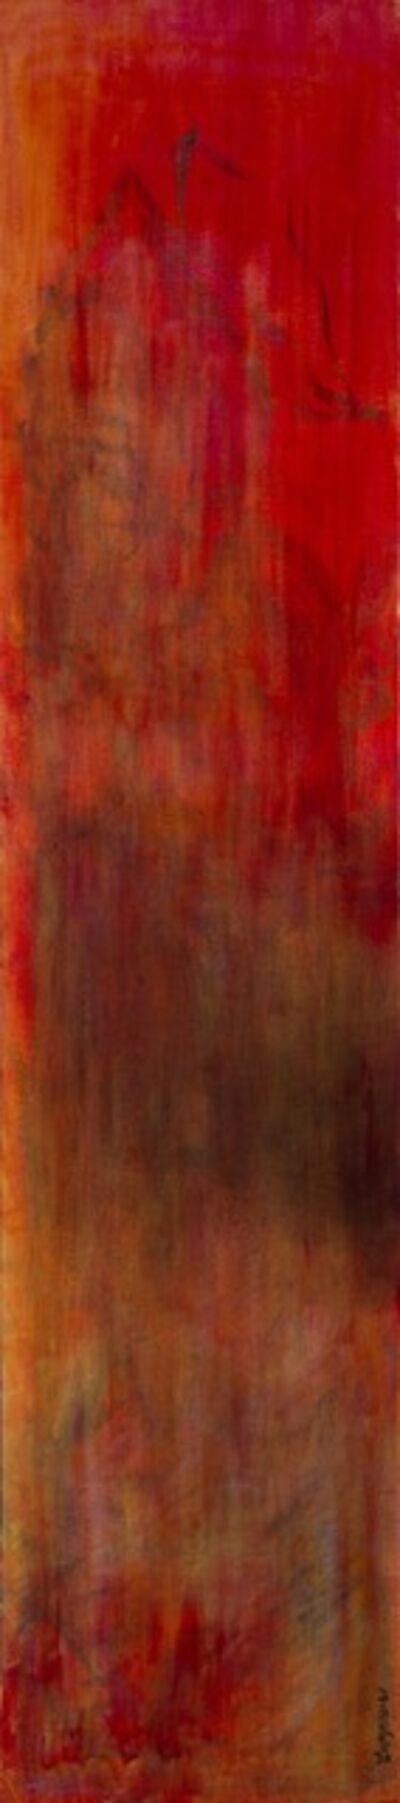 Julie Lazarus, 'Giardini Acqua Alta Dopo C(2)', 2020